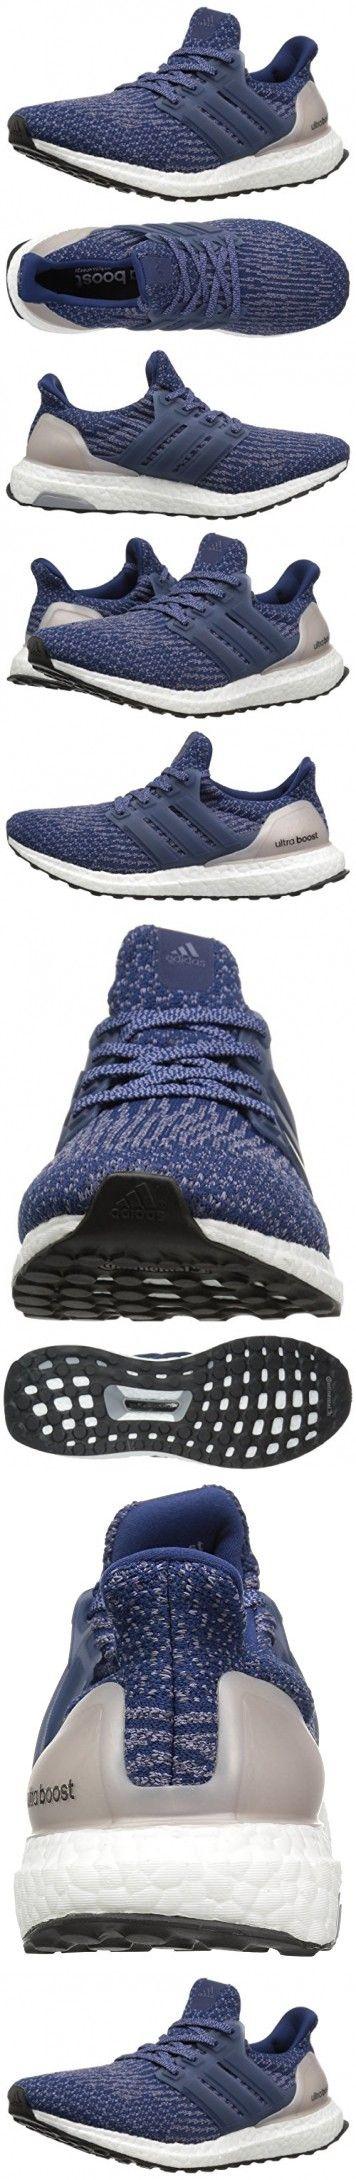 Adidas Performance Women's Ultraboost w Running Shoe, Mystery Blue/Mystery Blue/Vapour Grey, 8.5 M US